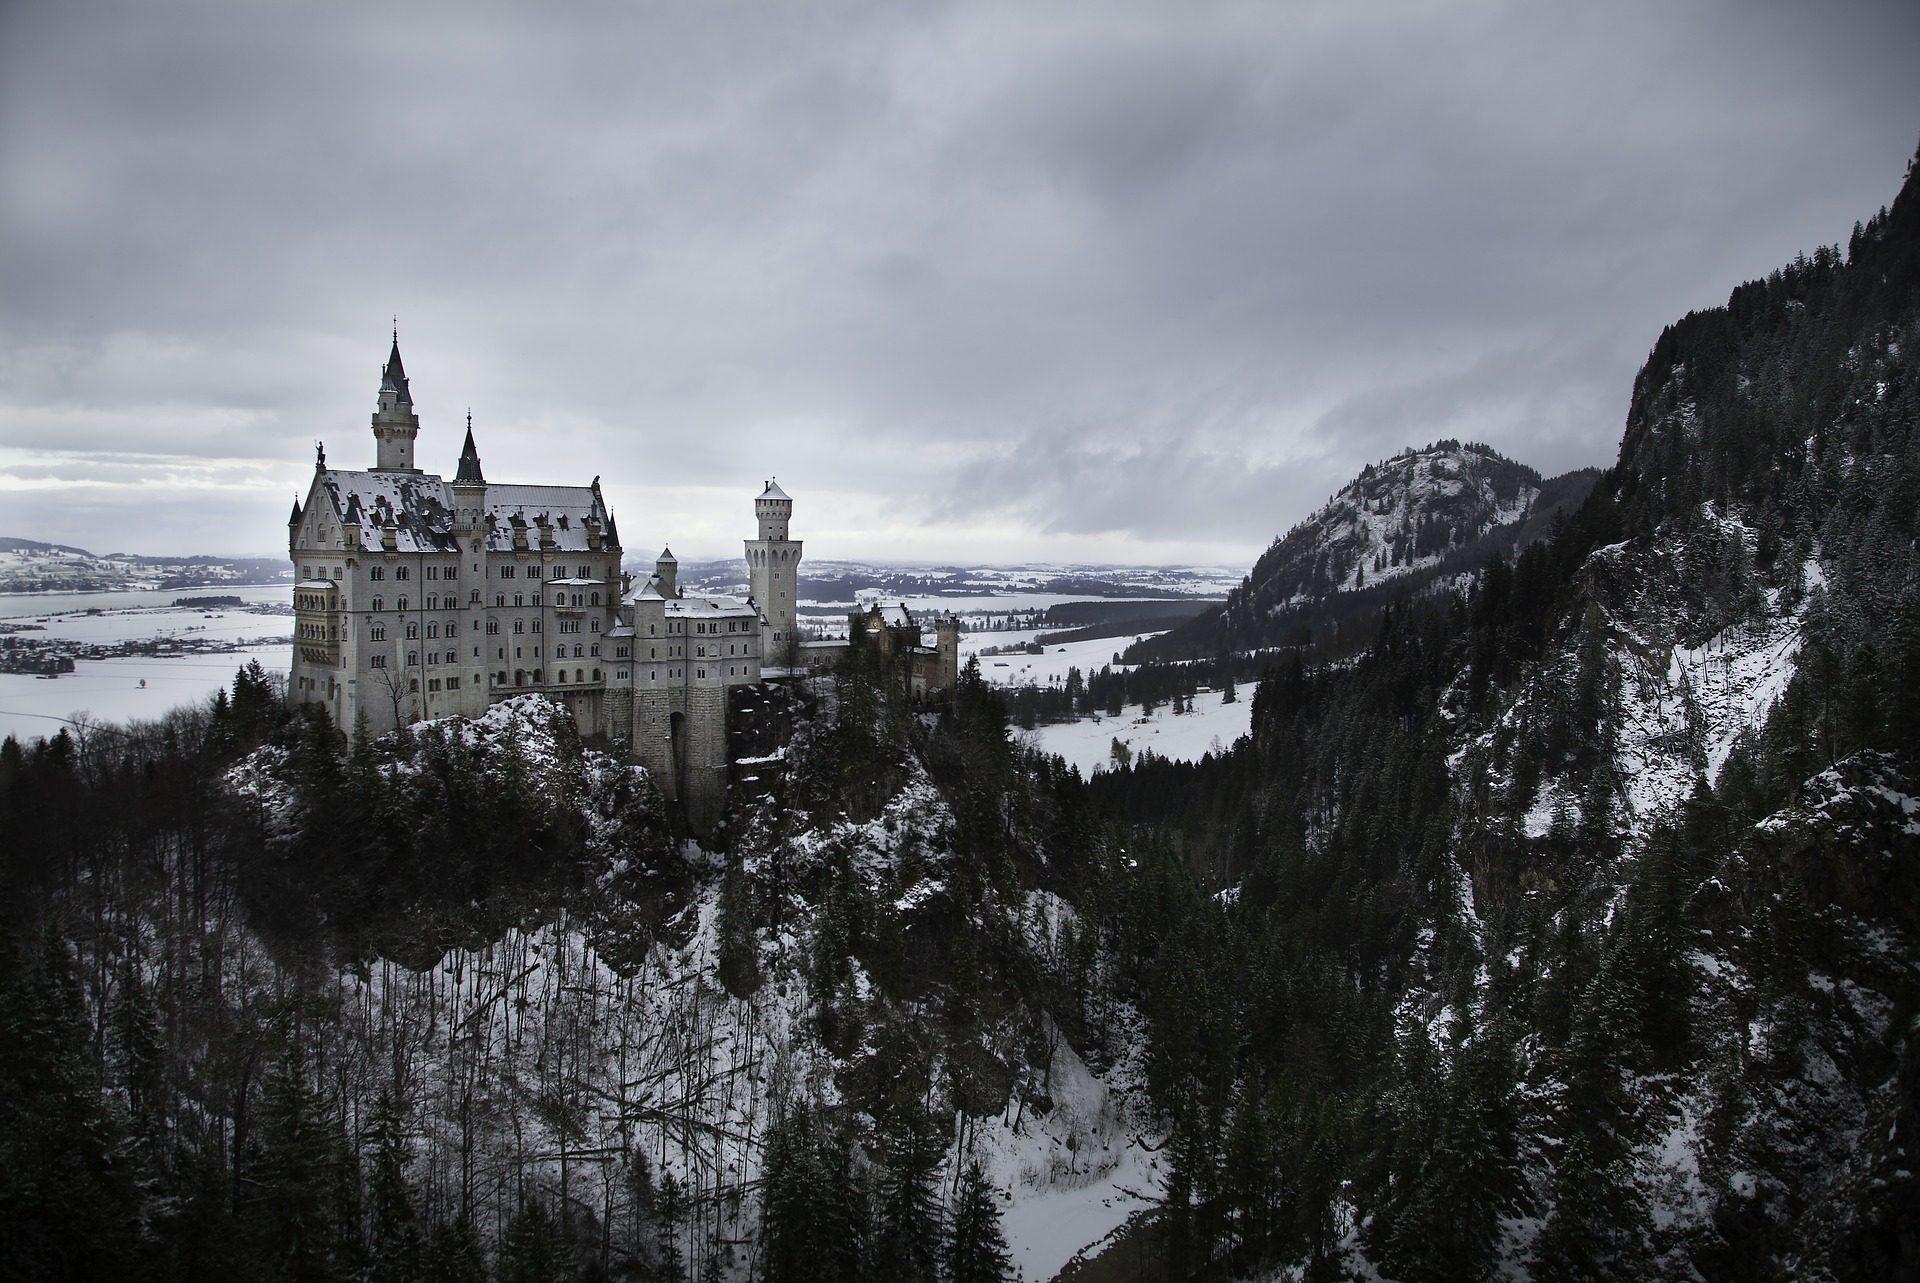 महल, किले, Montañas, बर्फ, बादल, पेड़ - HD वॉलपेपर - प्रोफेसर-falken.com